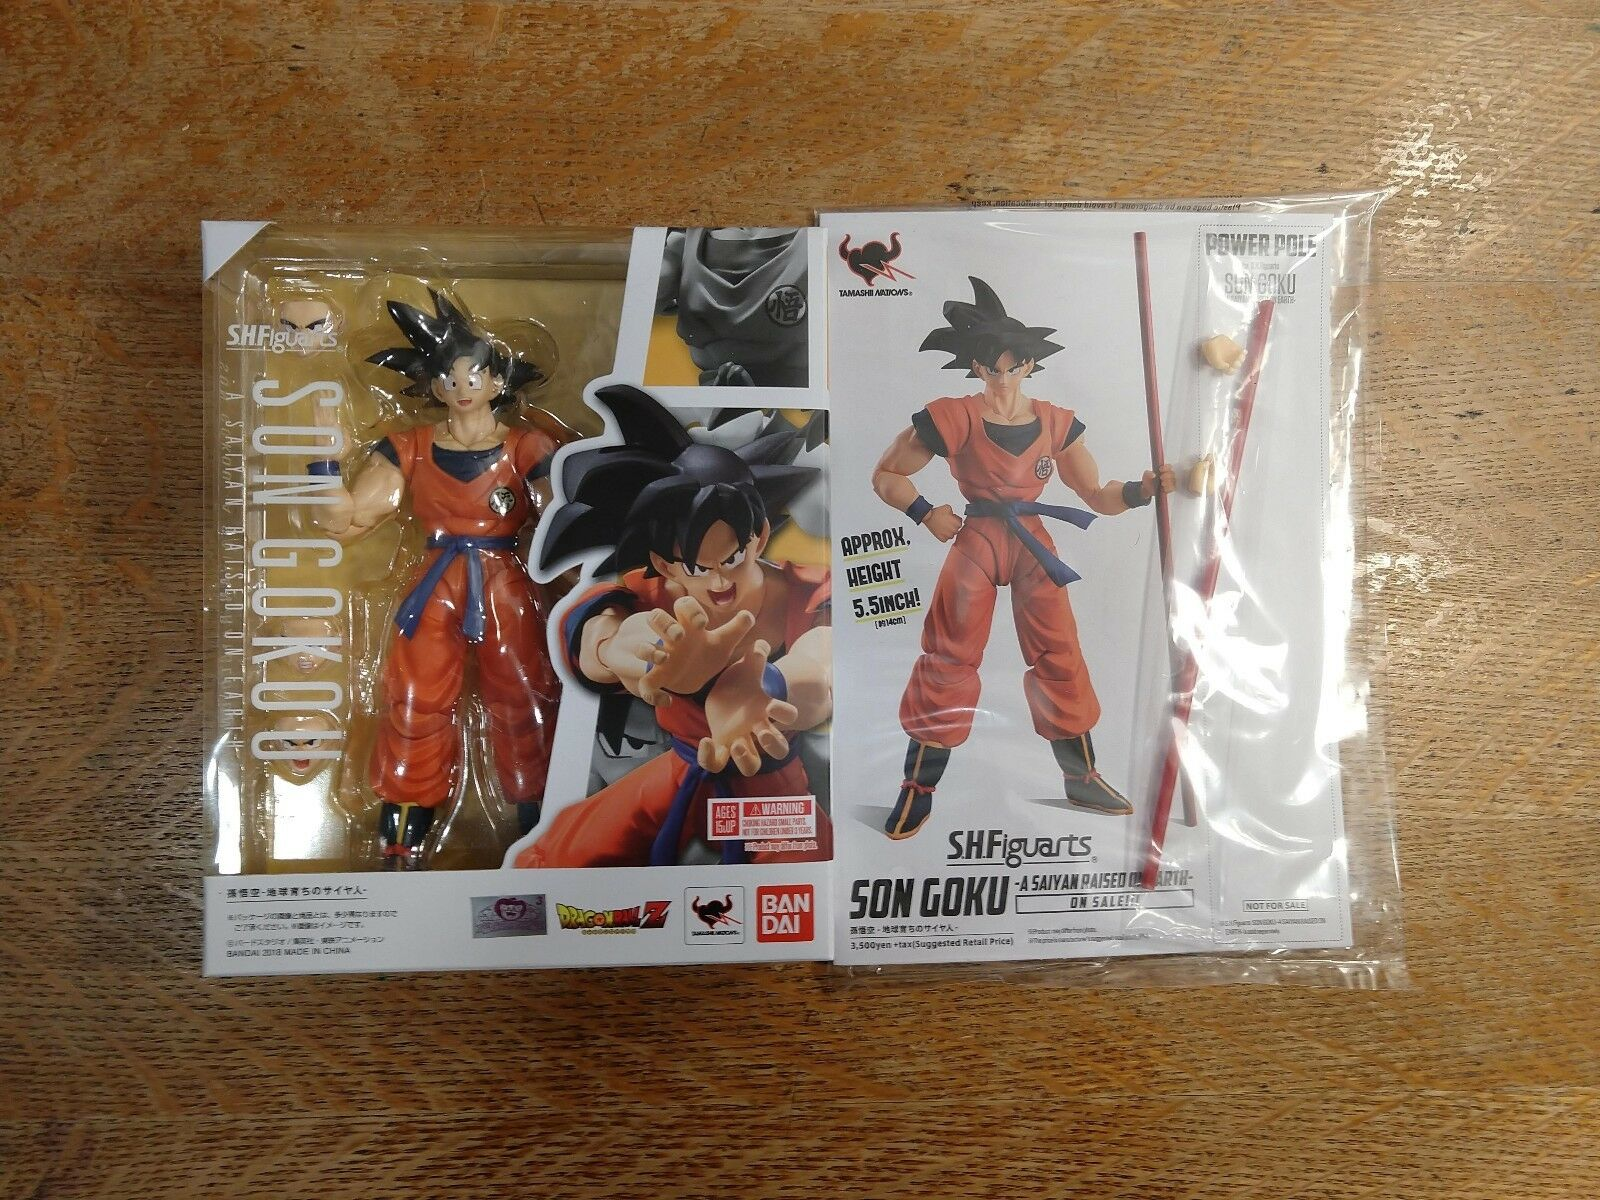 Authentic s.h. figuarts DBZ NYCC Goku 2.0 Saiyan Raised on Earth & Power Pole